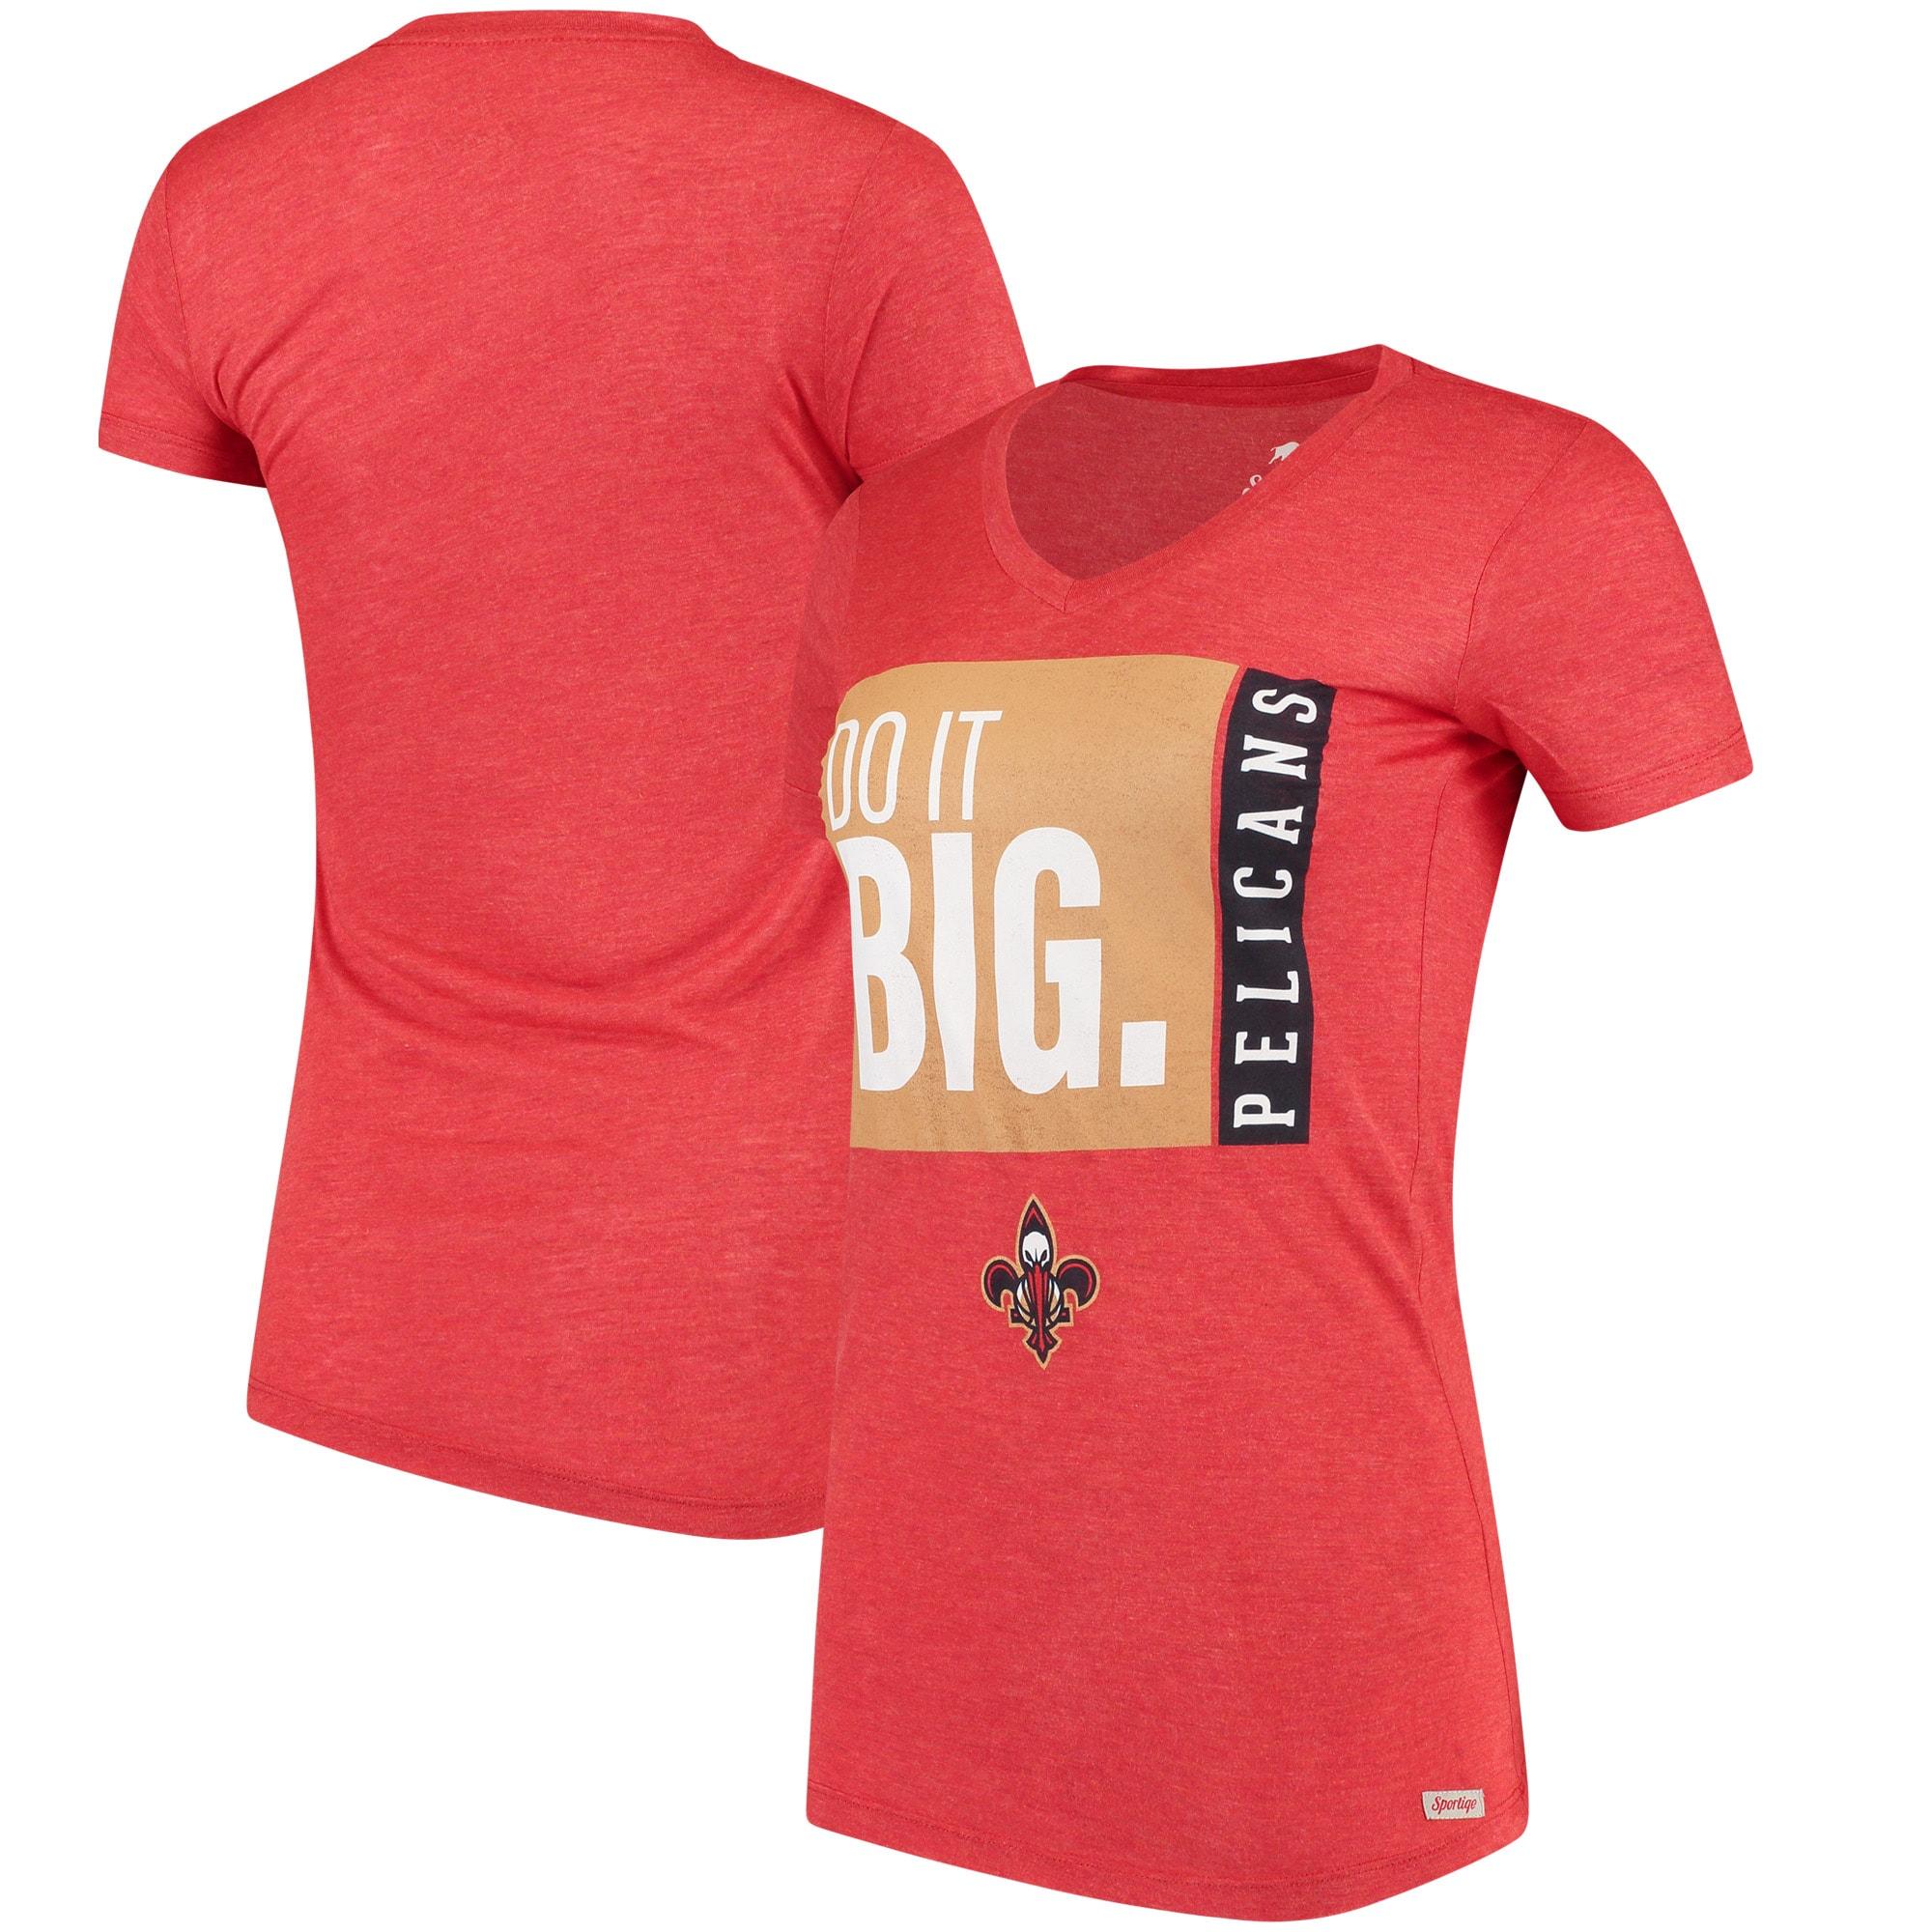 New Orleans Pelicans Sportiqe Women's Comfy Do it Big V-Neck T-Shirt - Red